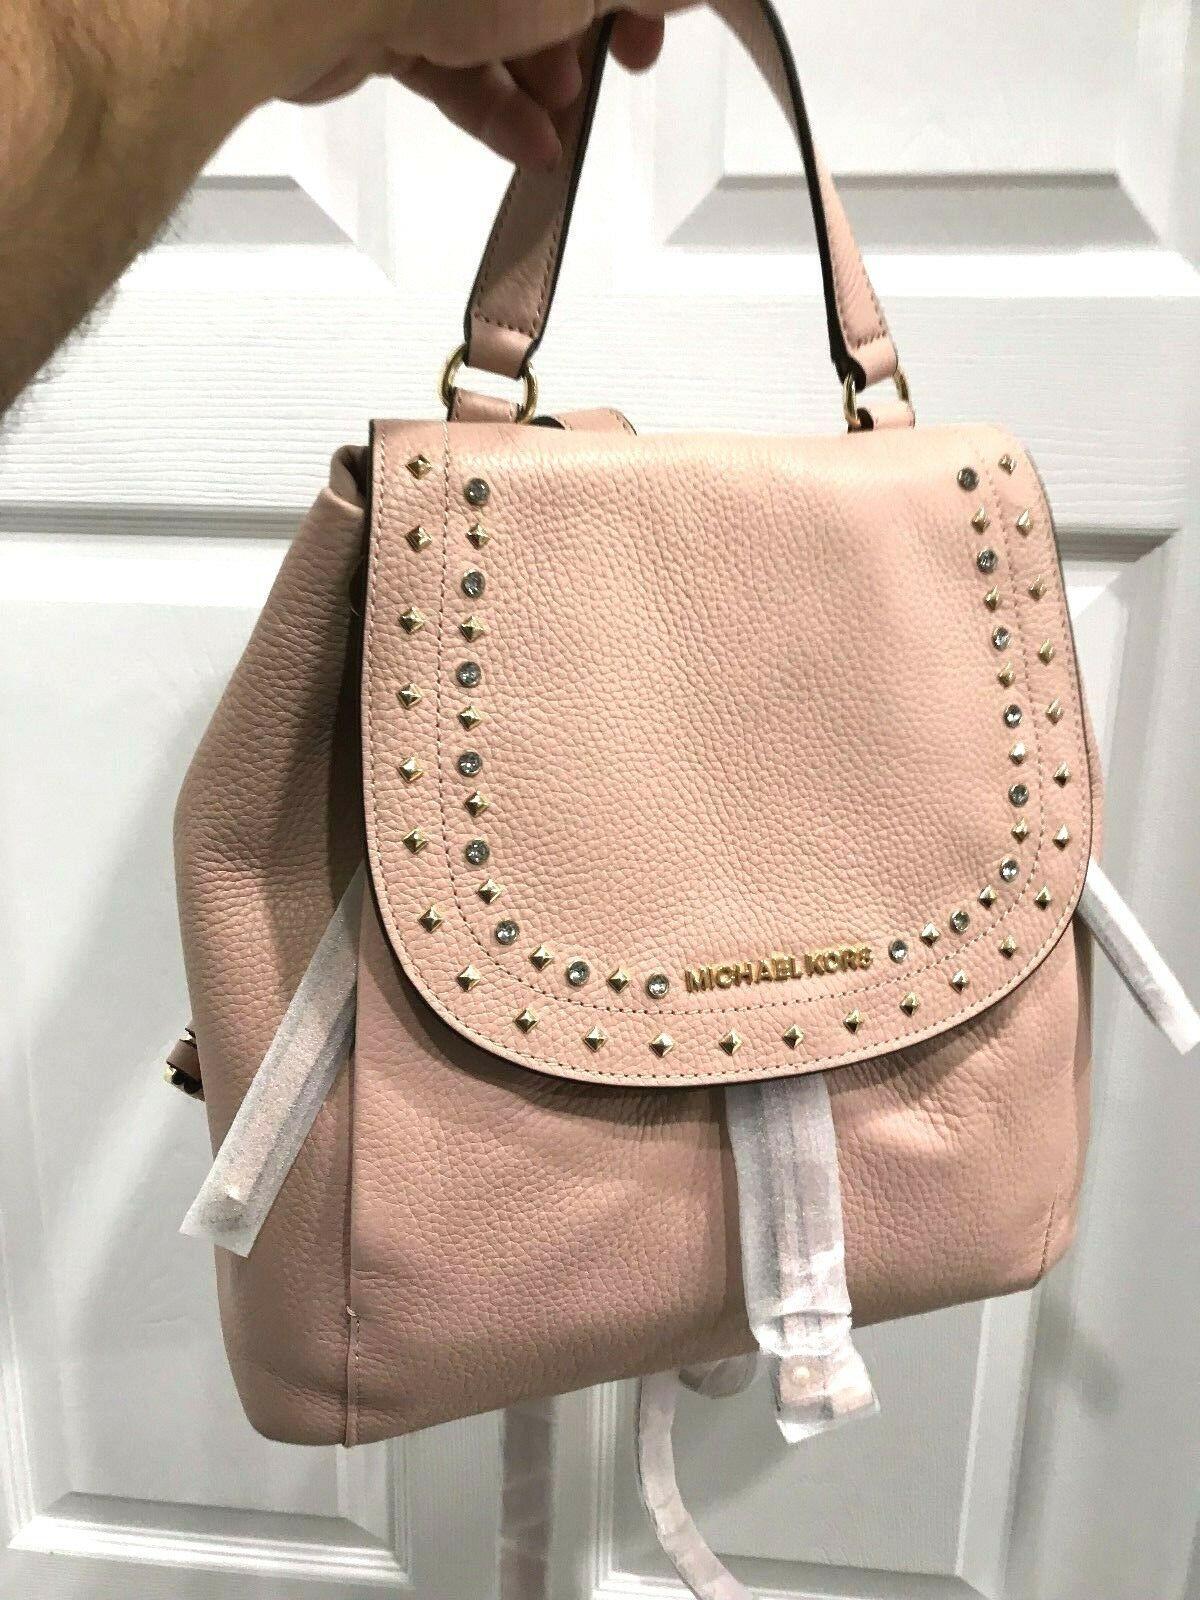 3f7613e834f7 Michael Kors Jet Set Large Riley Jewels & Studs Backpack Pastel Pink $428  New